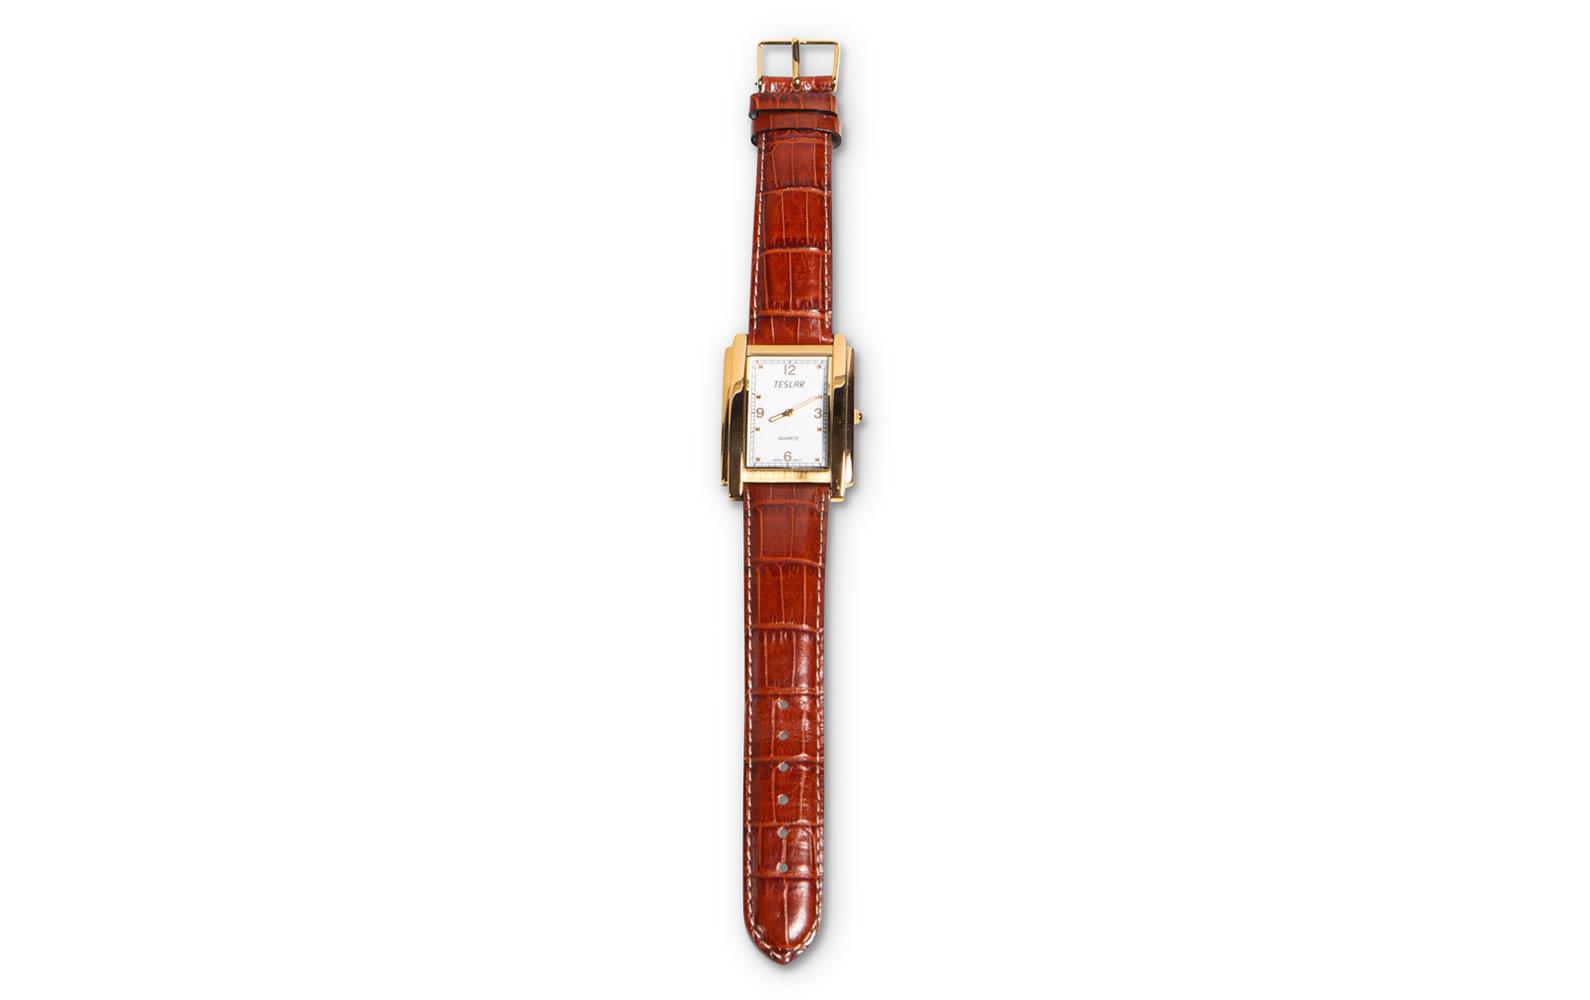 Prod/O21E - Phil Hill C 2021/C0075_Teslar Quartz Watch in Box with Warranty Paper/C0075_Teslar_Quartz_Watch_4_ukrd1h